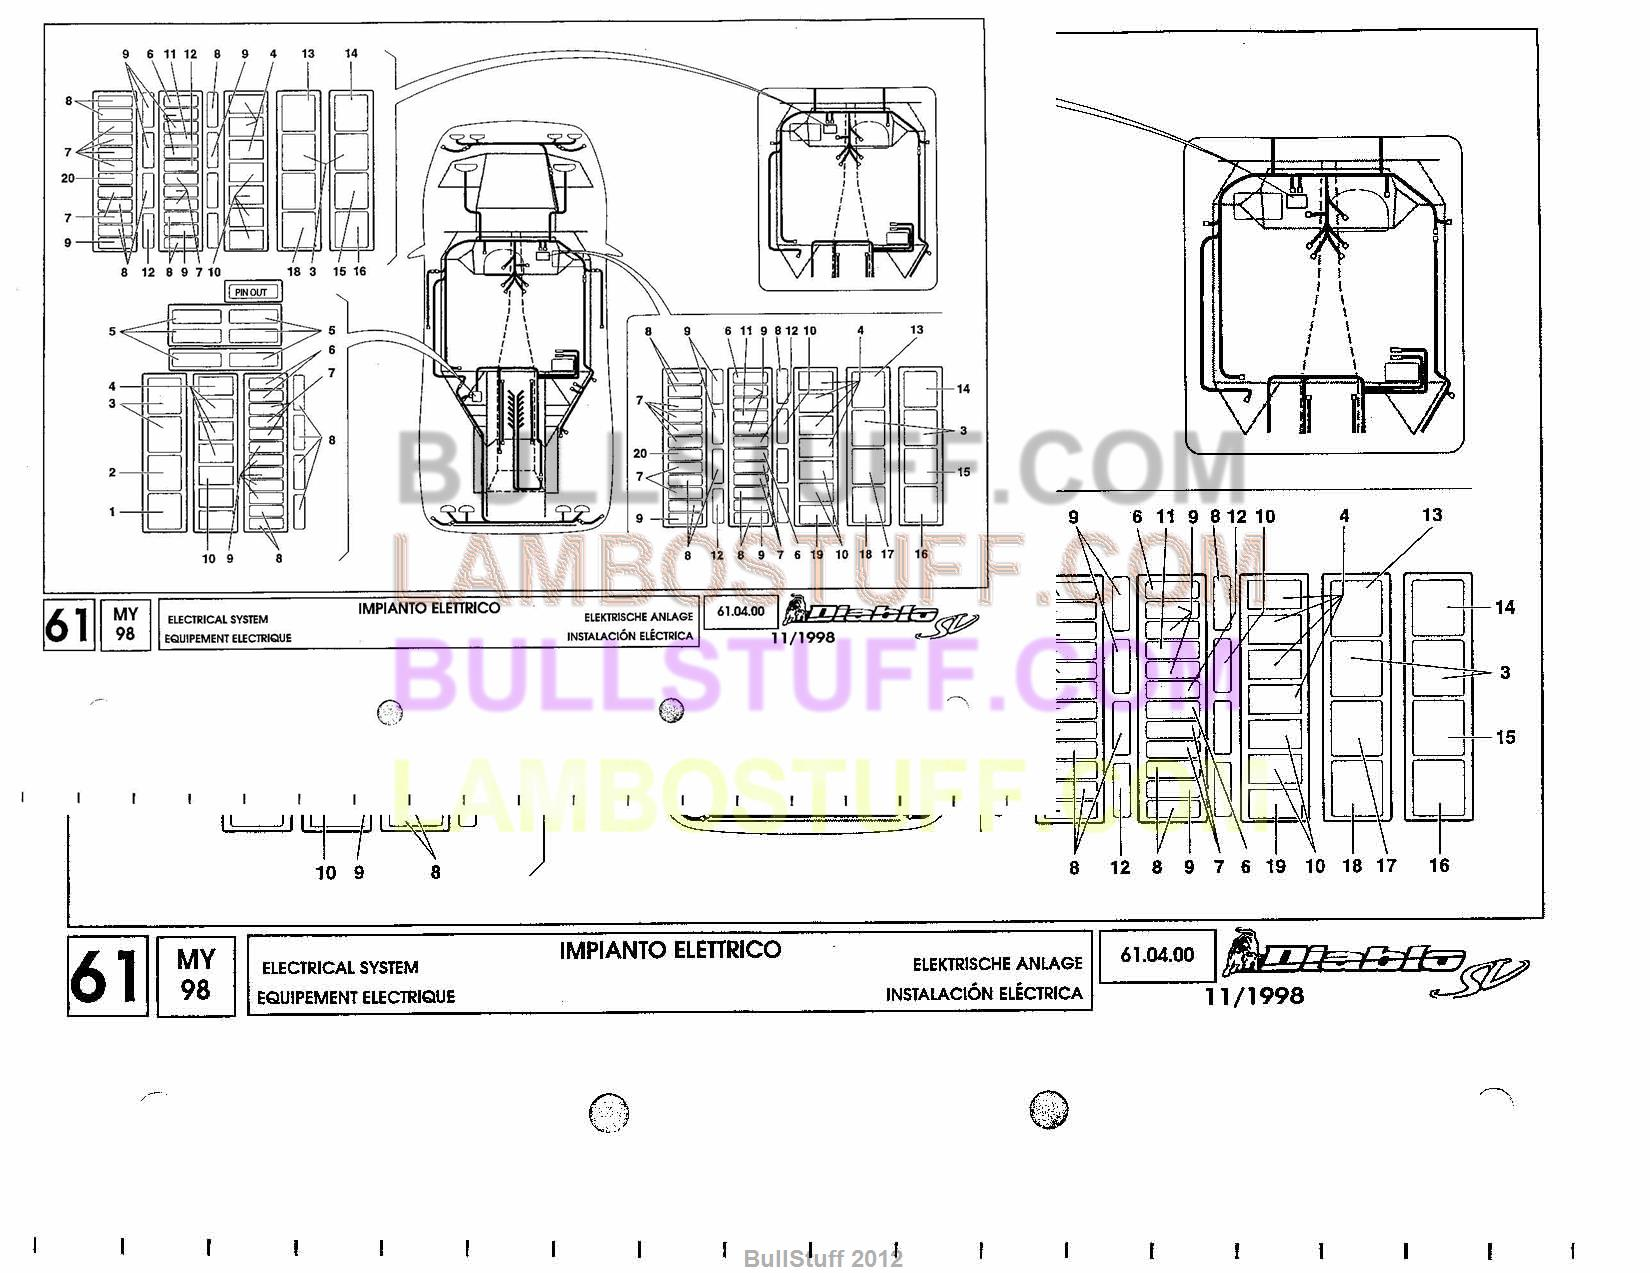 Lambo Diablo Diagram Electrical Wiring Diagrams Lamborghini Engine 1998 Sv Usa System 61 04 00 Vt Roadster